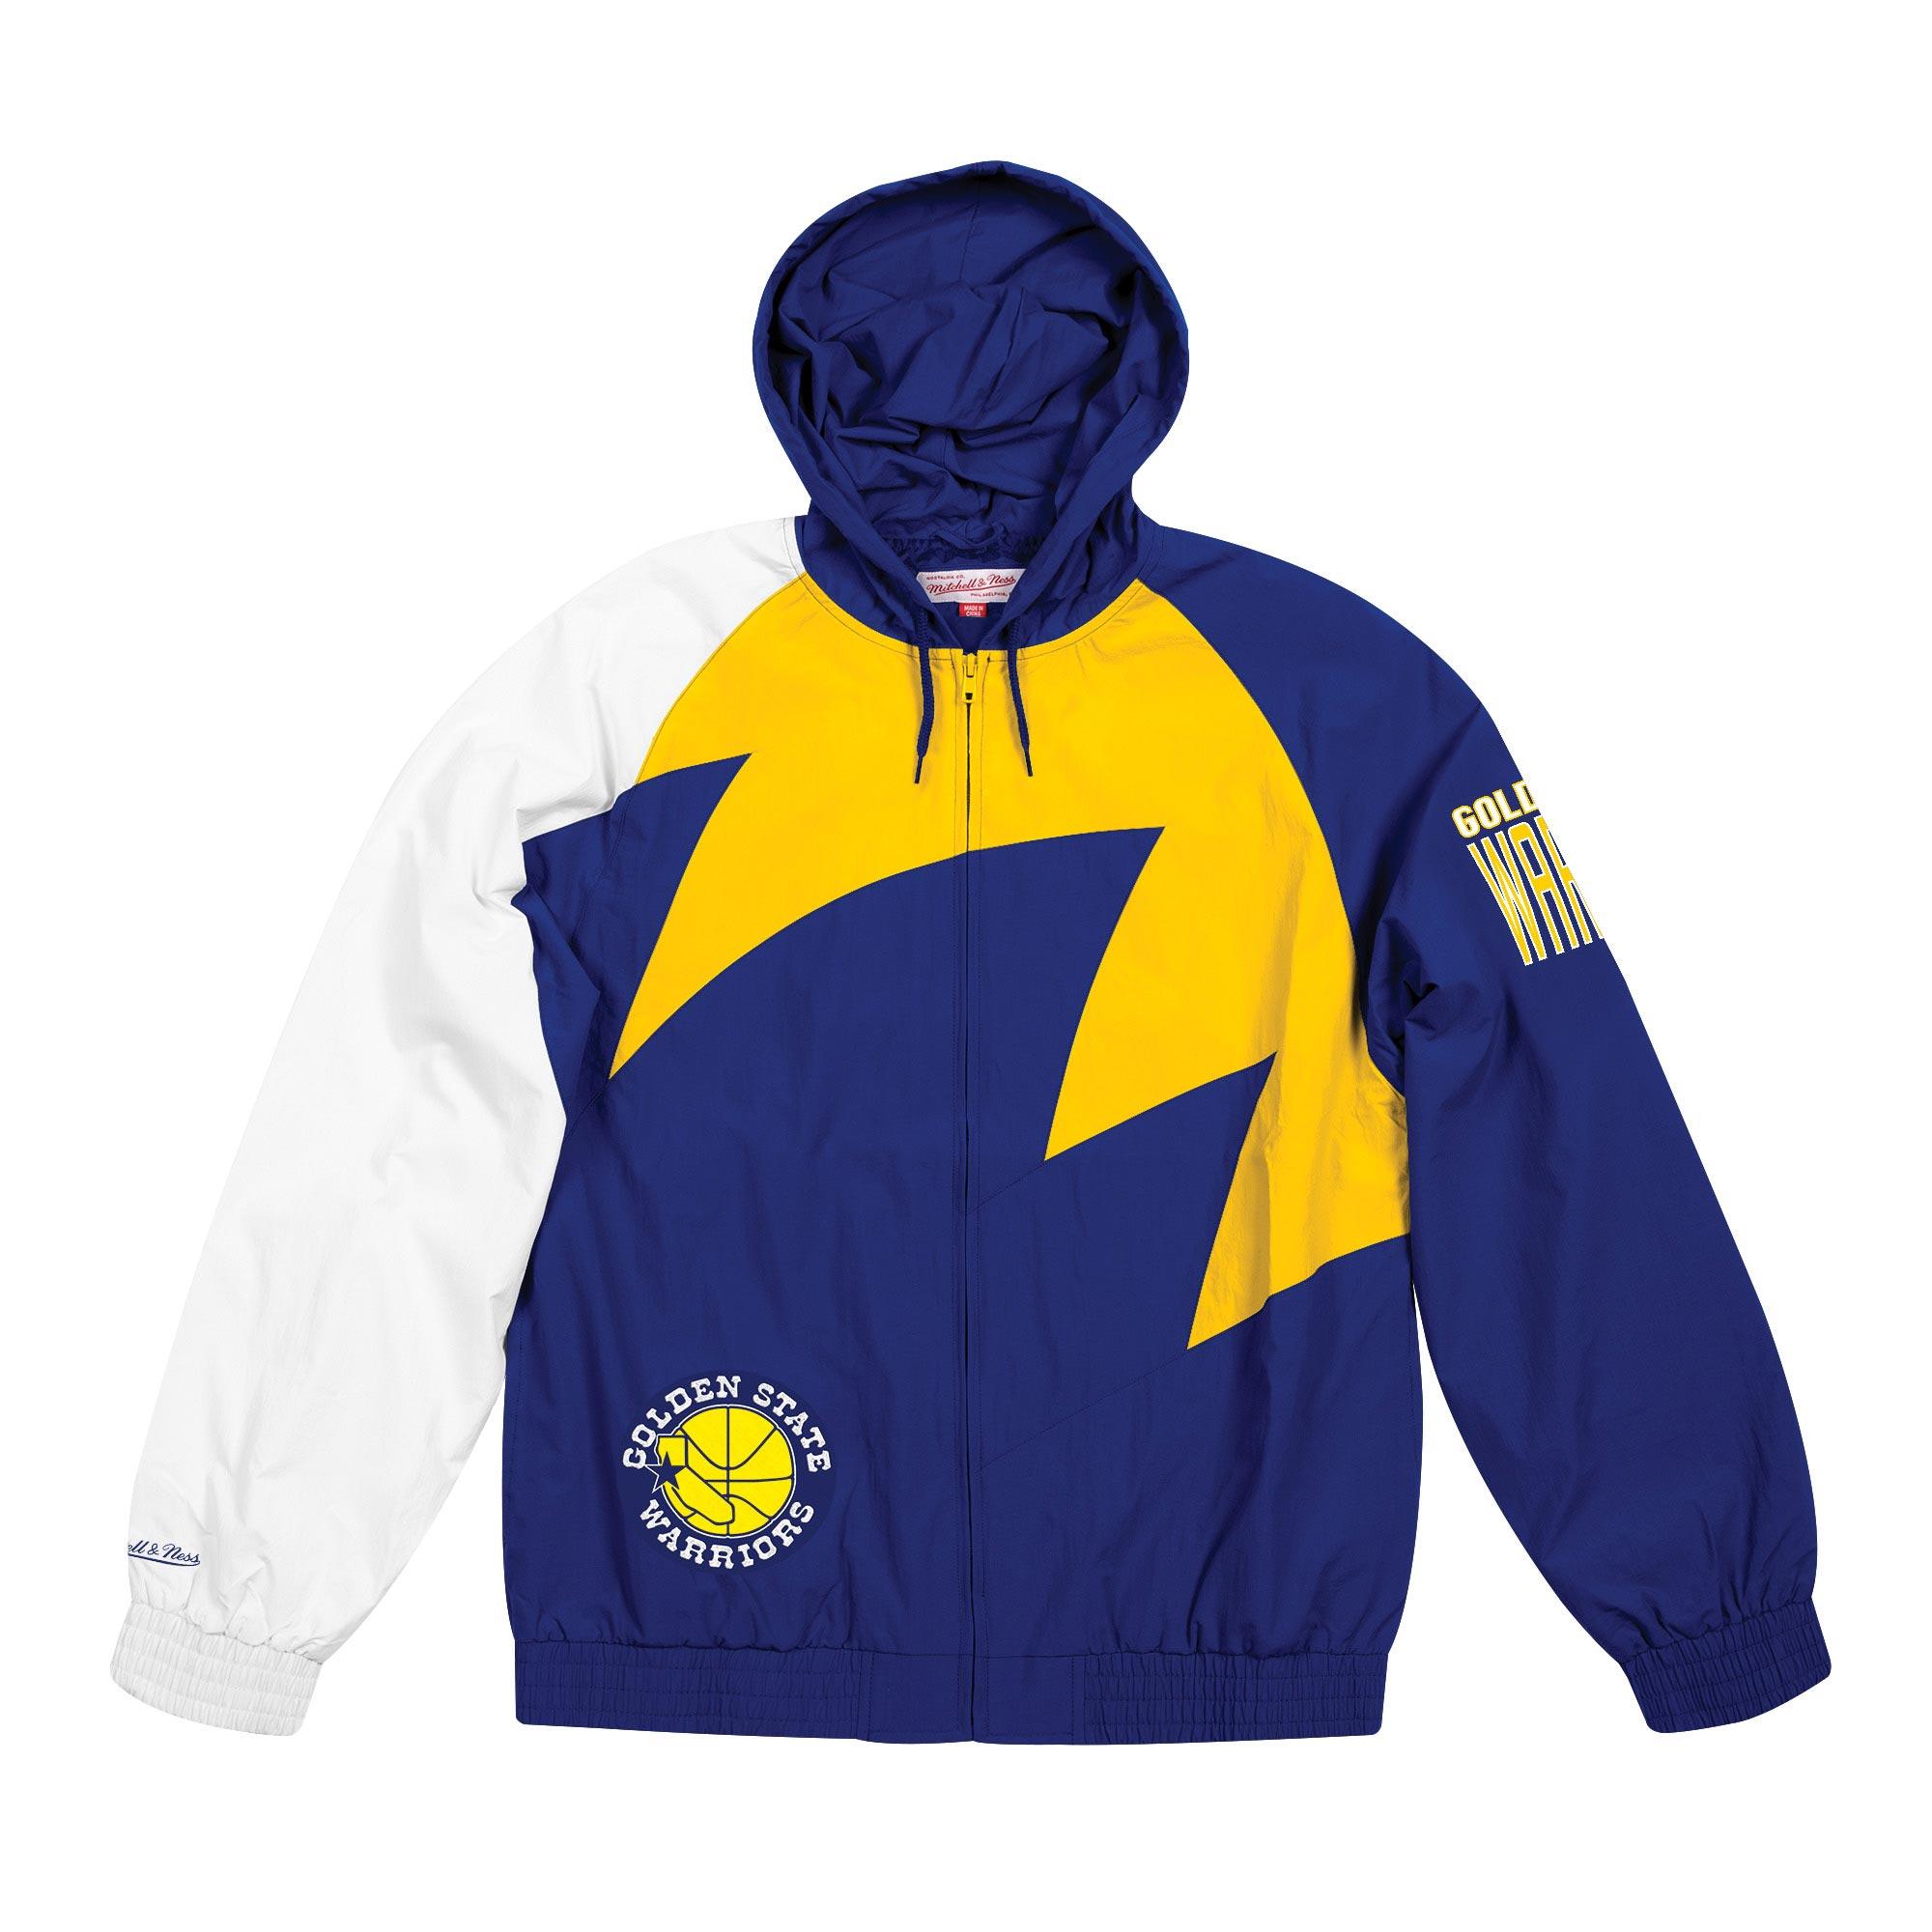 Club Branded / Chaqueta Sharktooth de los Golden State Warriors de Mitchell&Ness para hombre